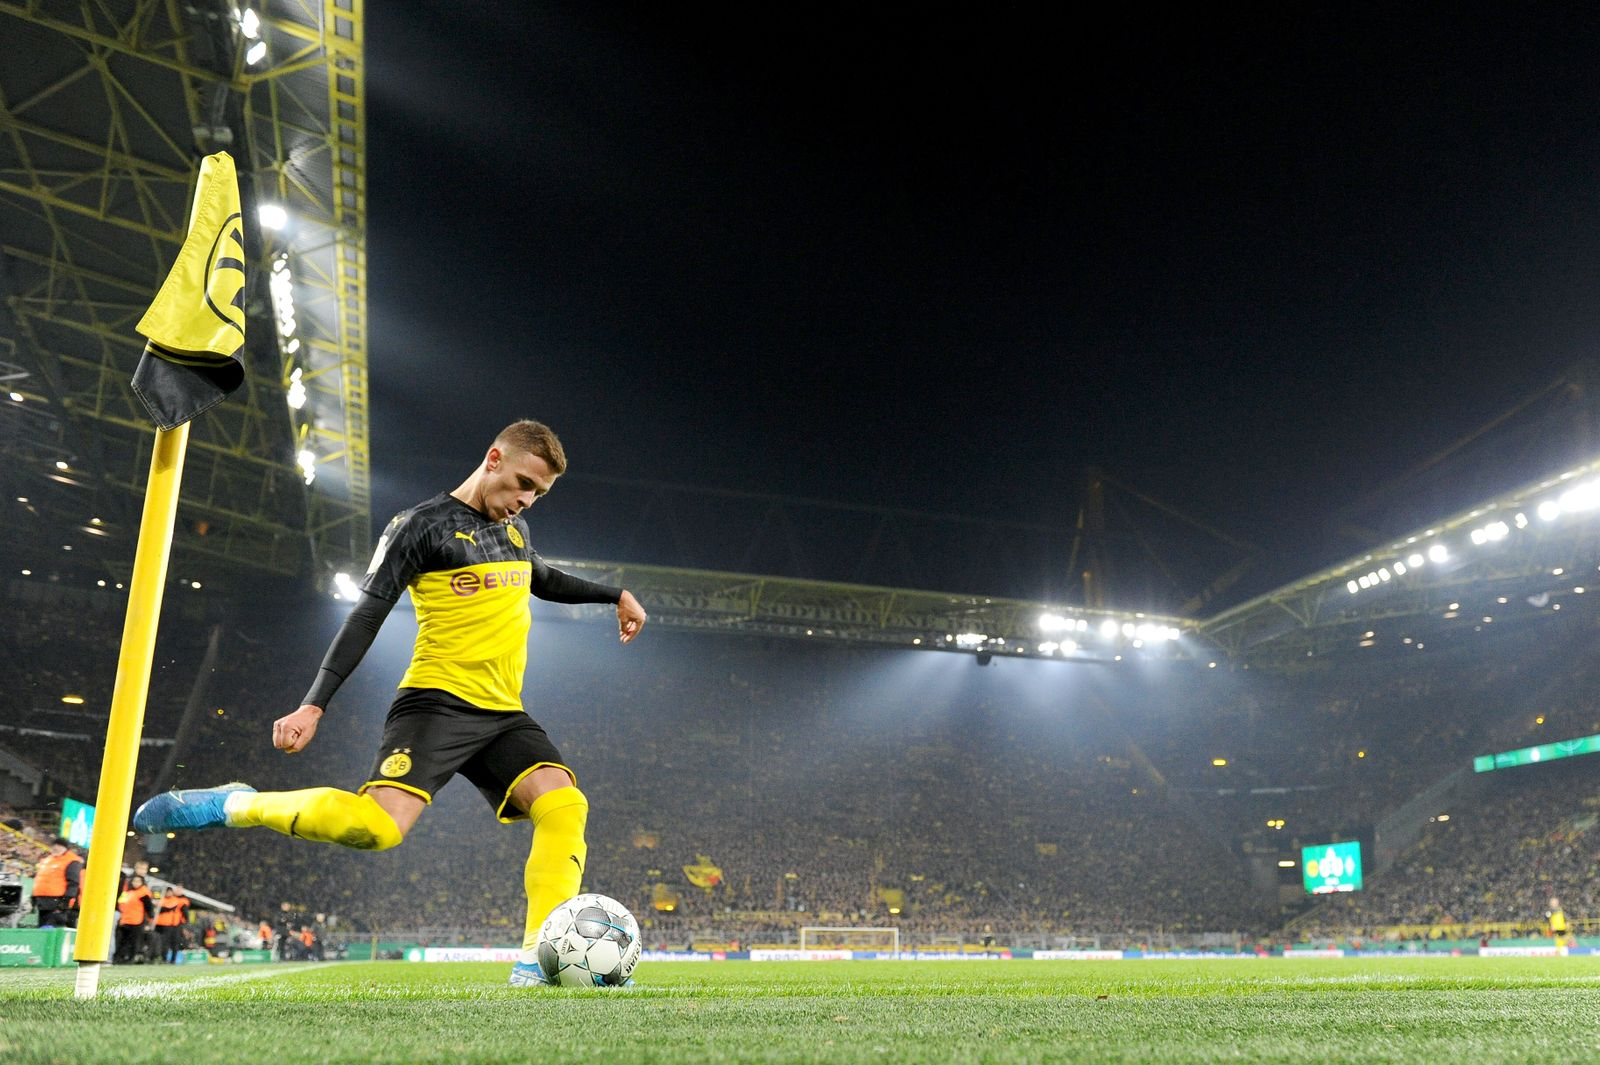 Fußball: DFB Pokal, Saison 2019/2020, Borussia Dortmund - Borussia Mönchengladbach am 30.10.2019 im Signal Iduna Park i